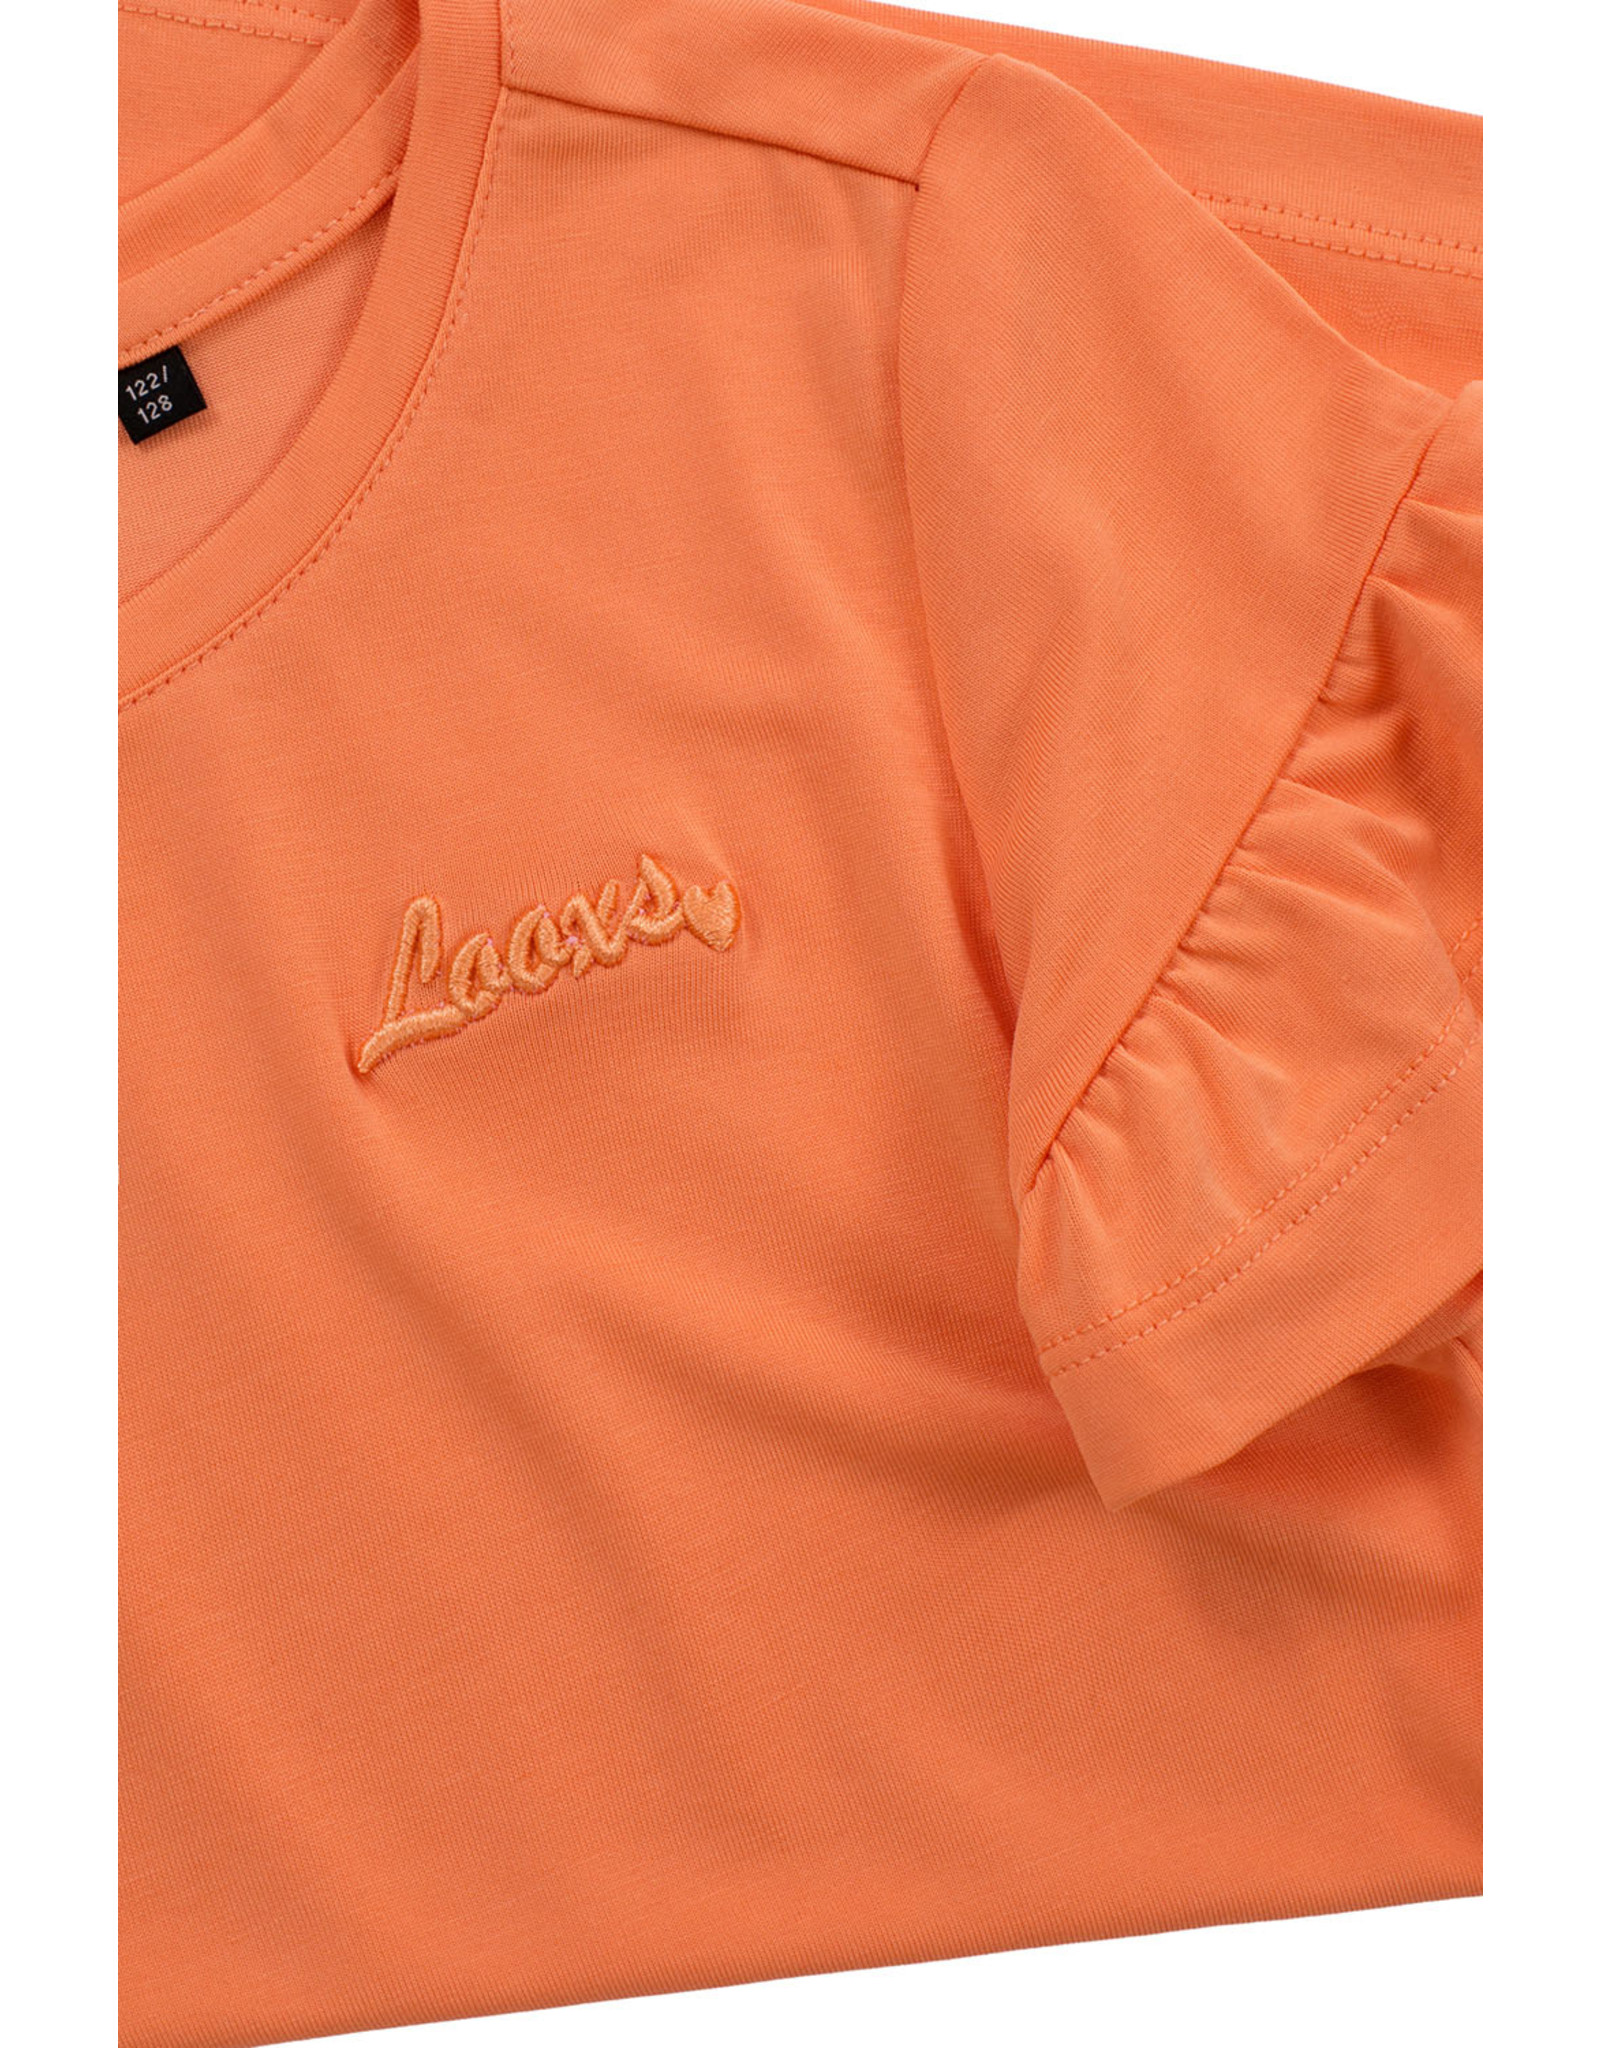 Looxs 10SIXTEEN 10Sixteen Modal T-shirt salmon